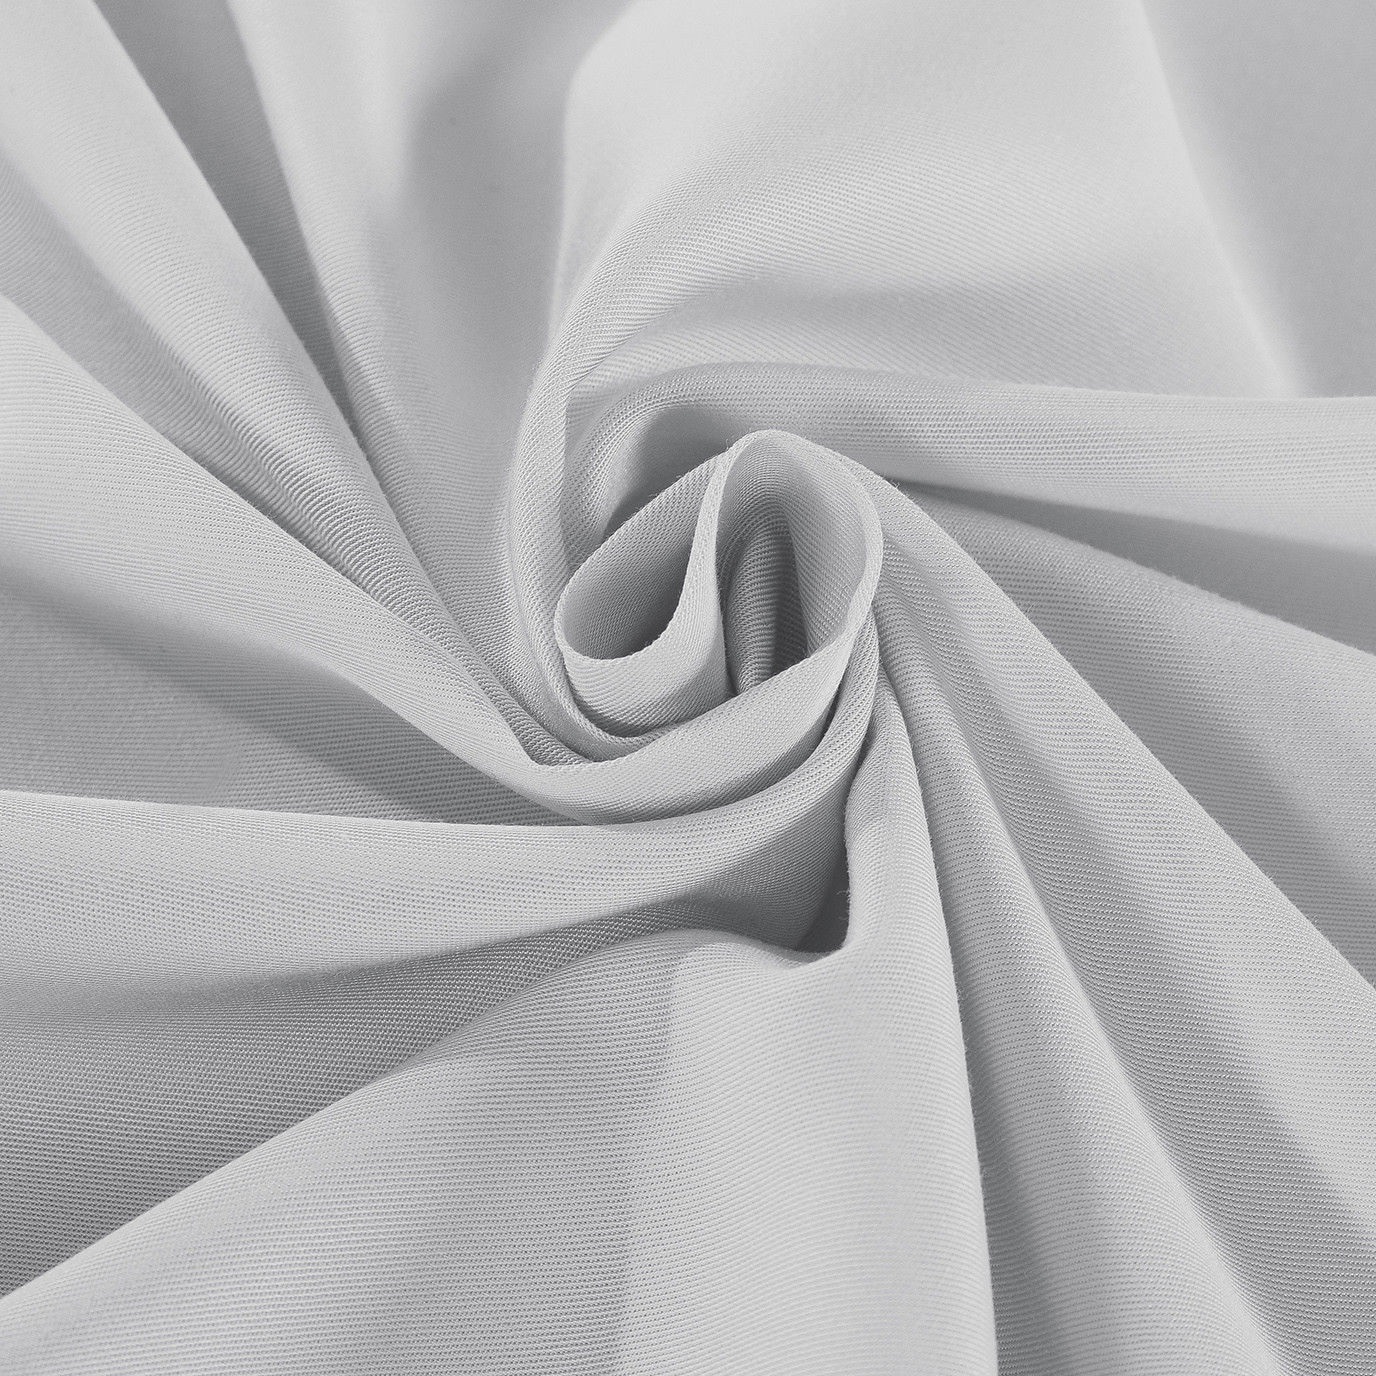 Royal-Comfort-Bamboo-Blended-Sheet-amp-Pillowcases-Set-1000TC-Ultra-Soft-Bedding thumbnail 28